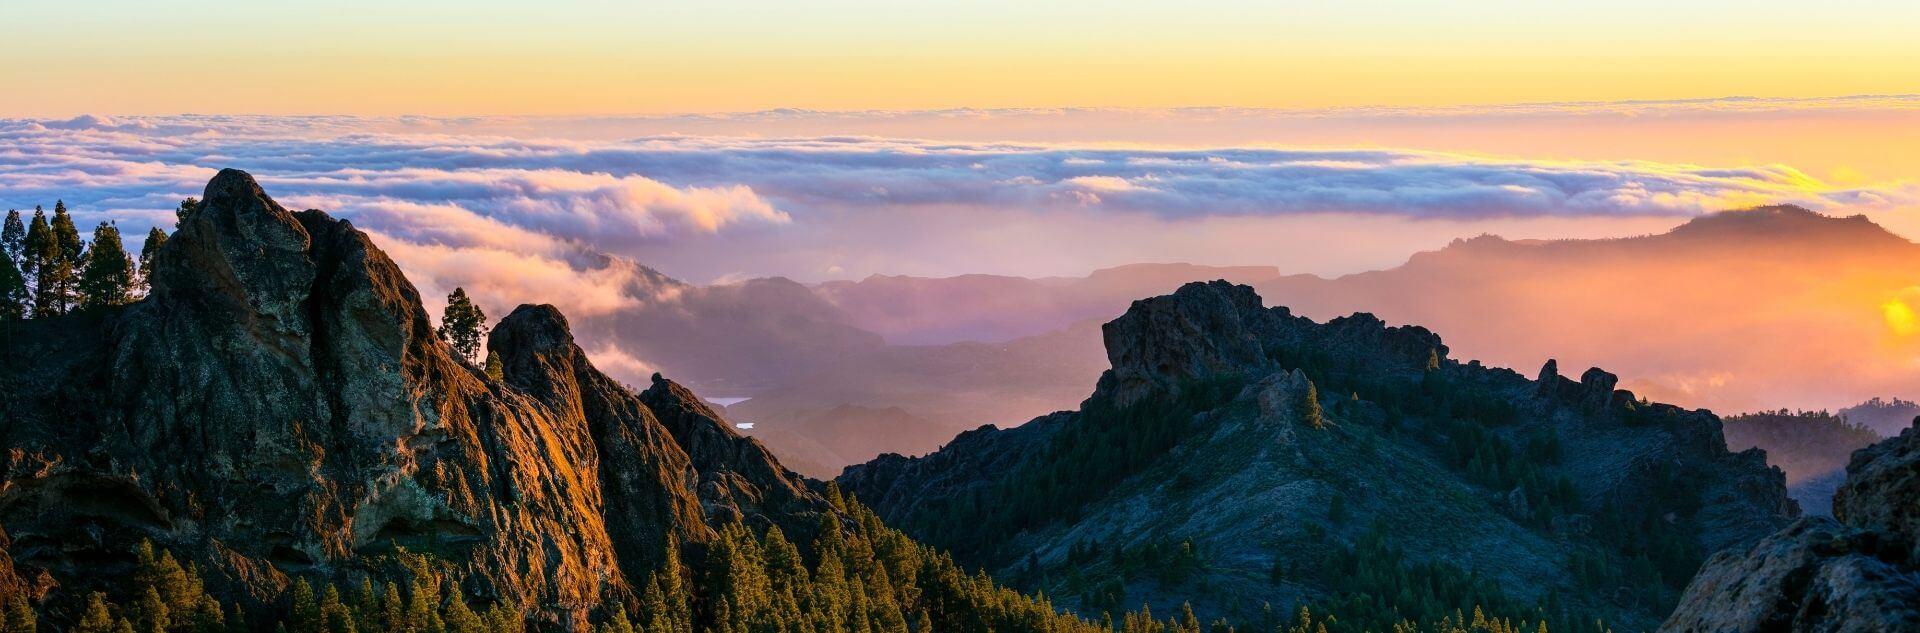 Sonnenaufgang Berglandschaft Gran Canaria